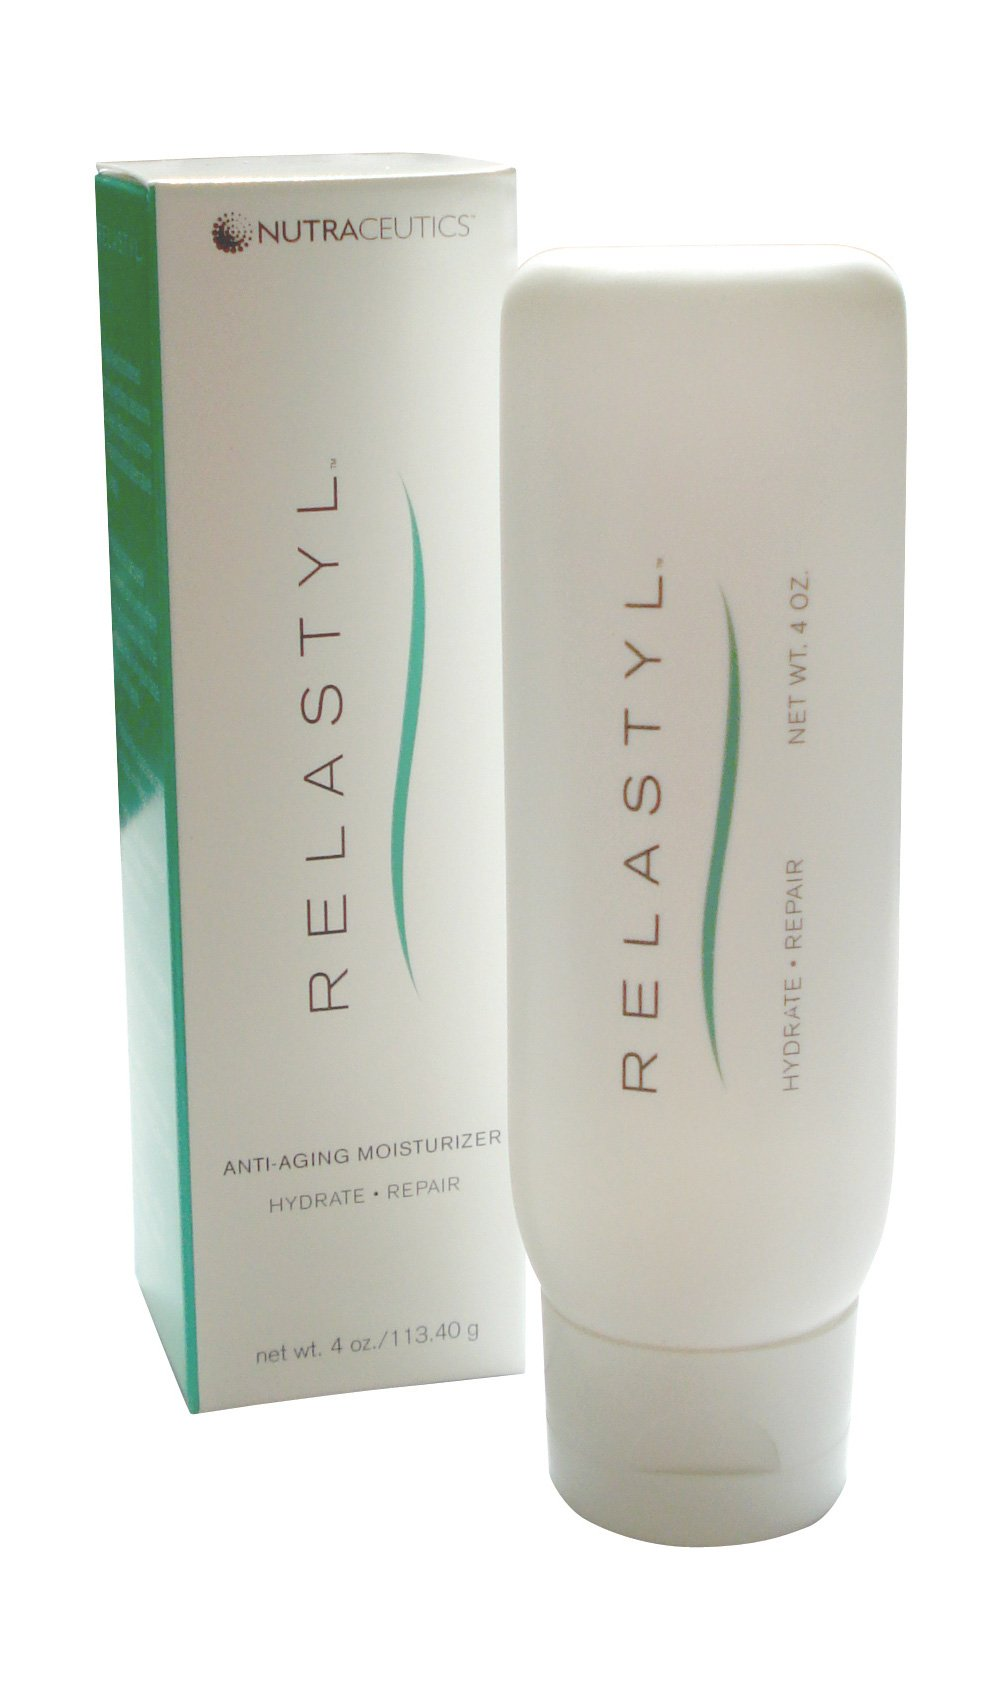 Nutraceutics Relastyl, 4 oz (Pack of 3)